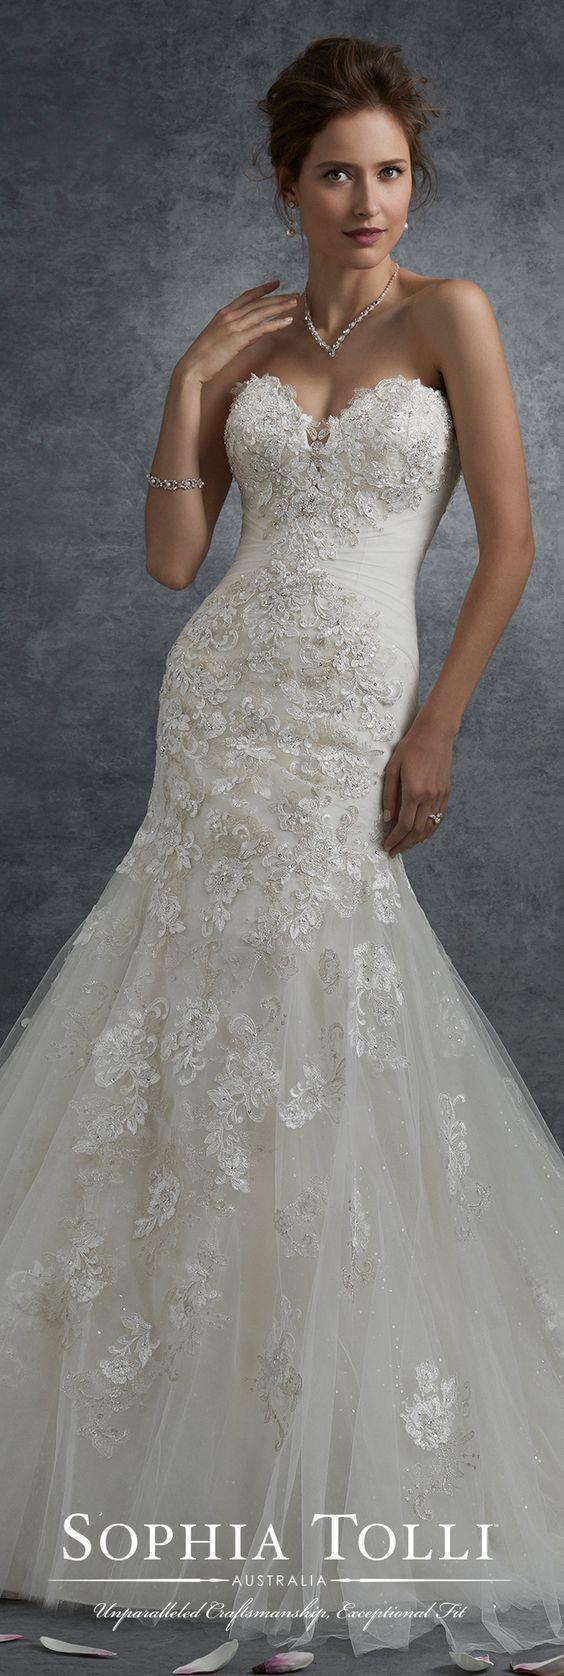 Nice dresses for wedding  Wedding Dress Inspiration  Sophia Tolli  Dress ideas Wedding